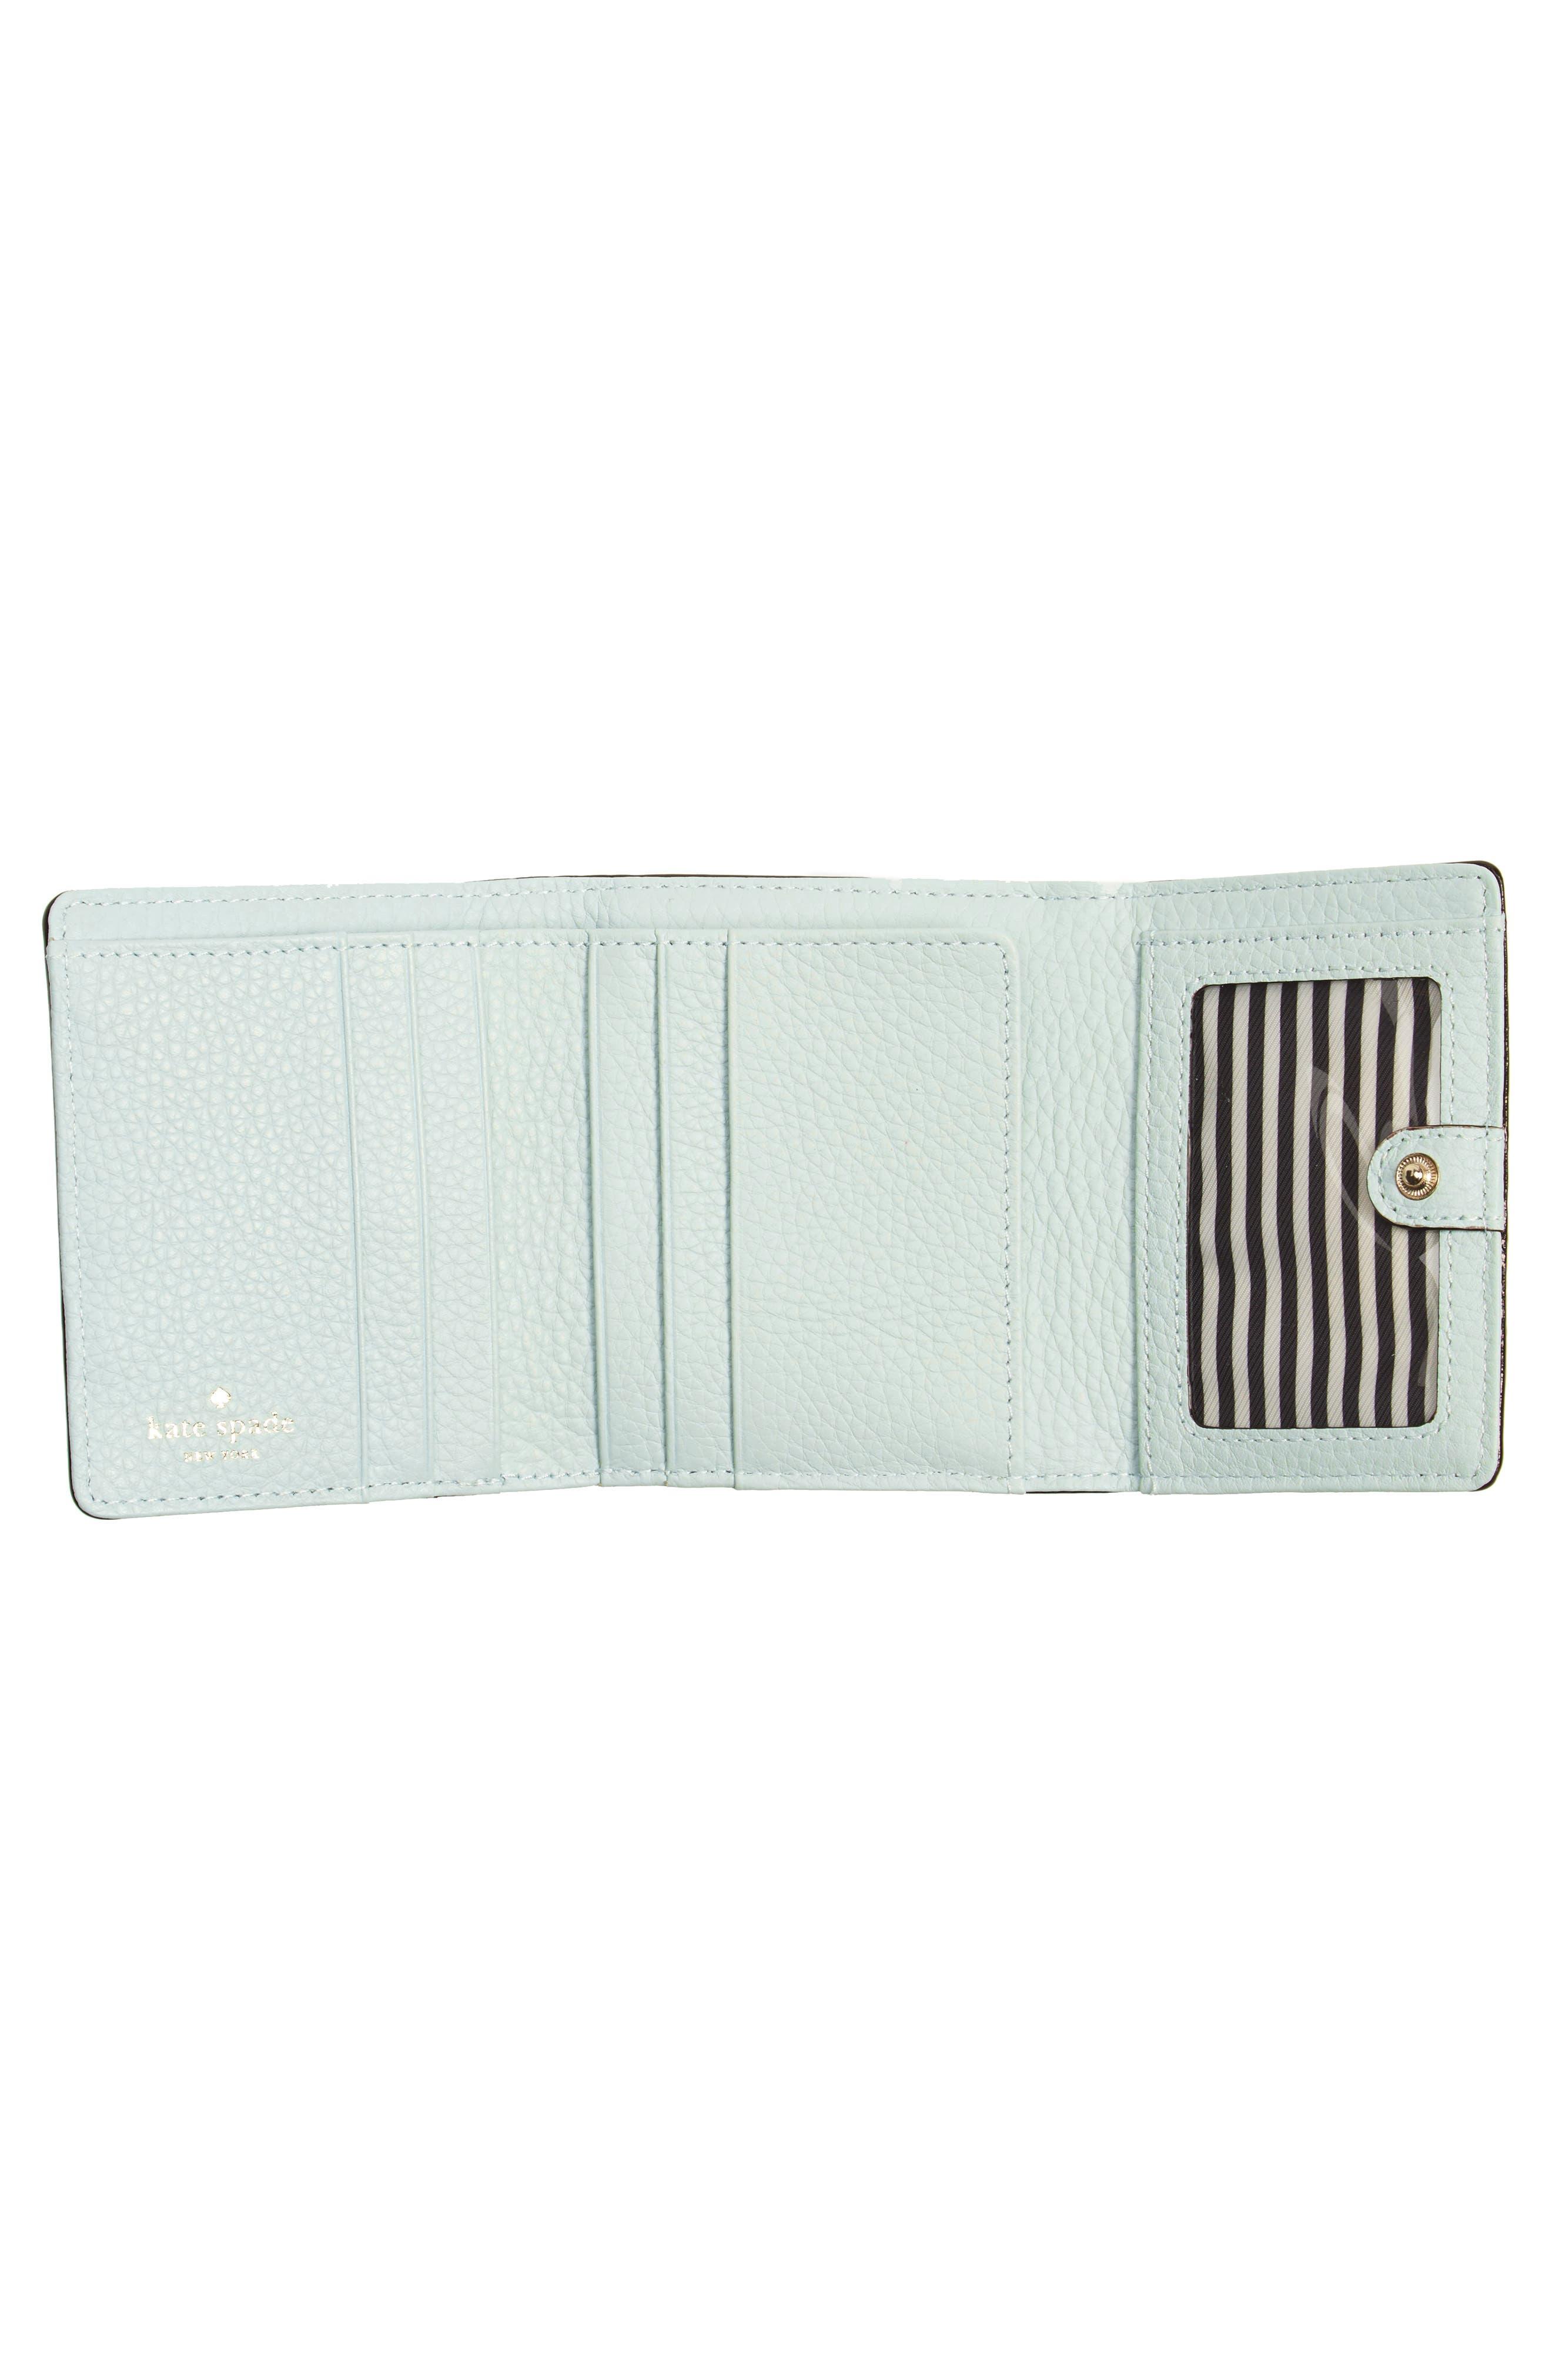 jackson street jada leather wallet,                             Alternate thumbnail 4, color,                             Misty Mint